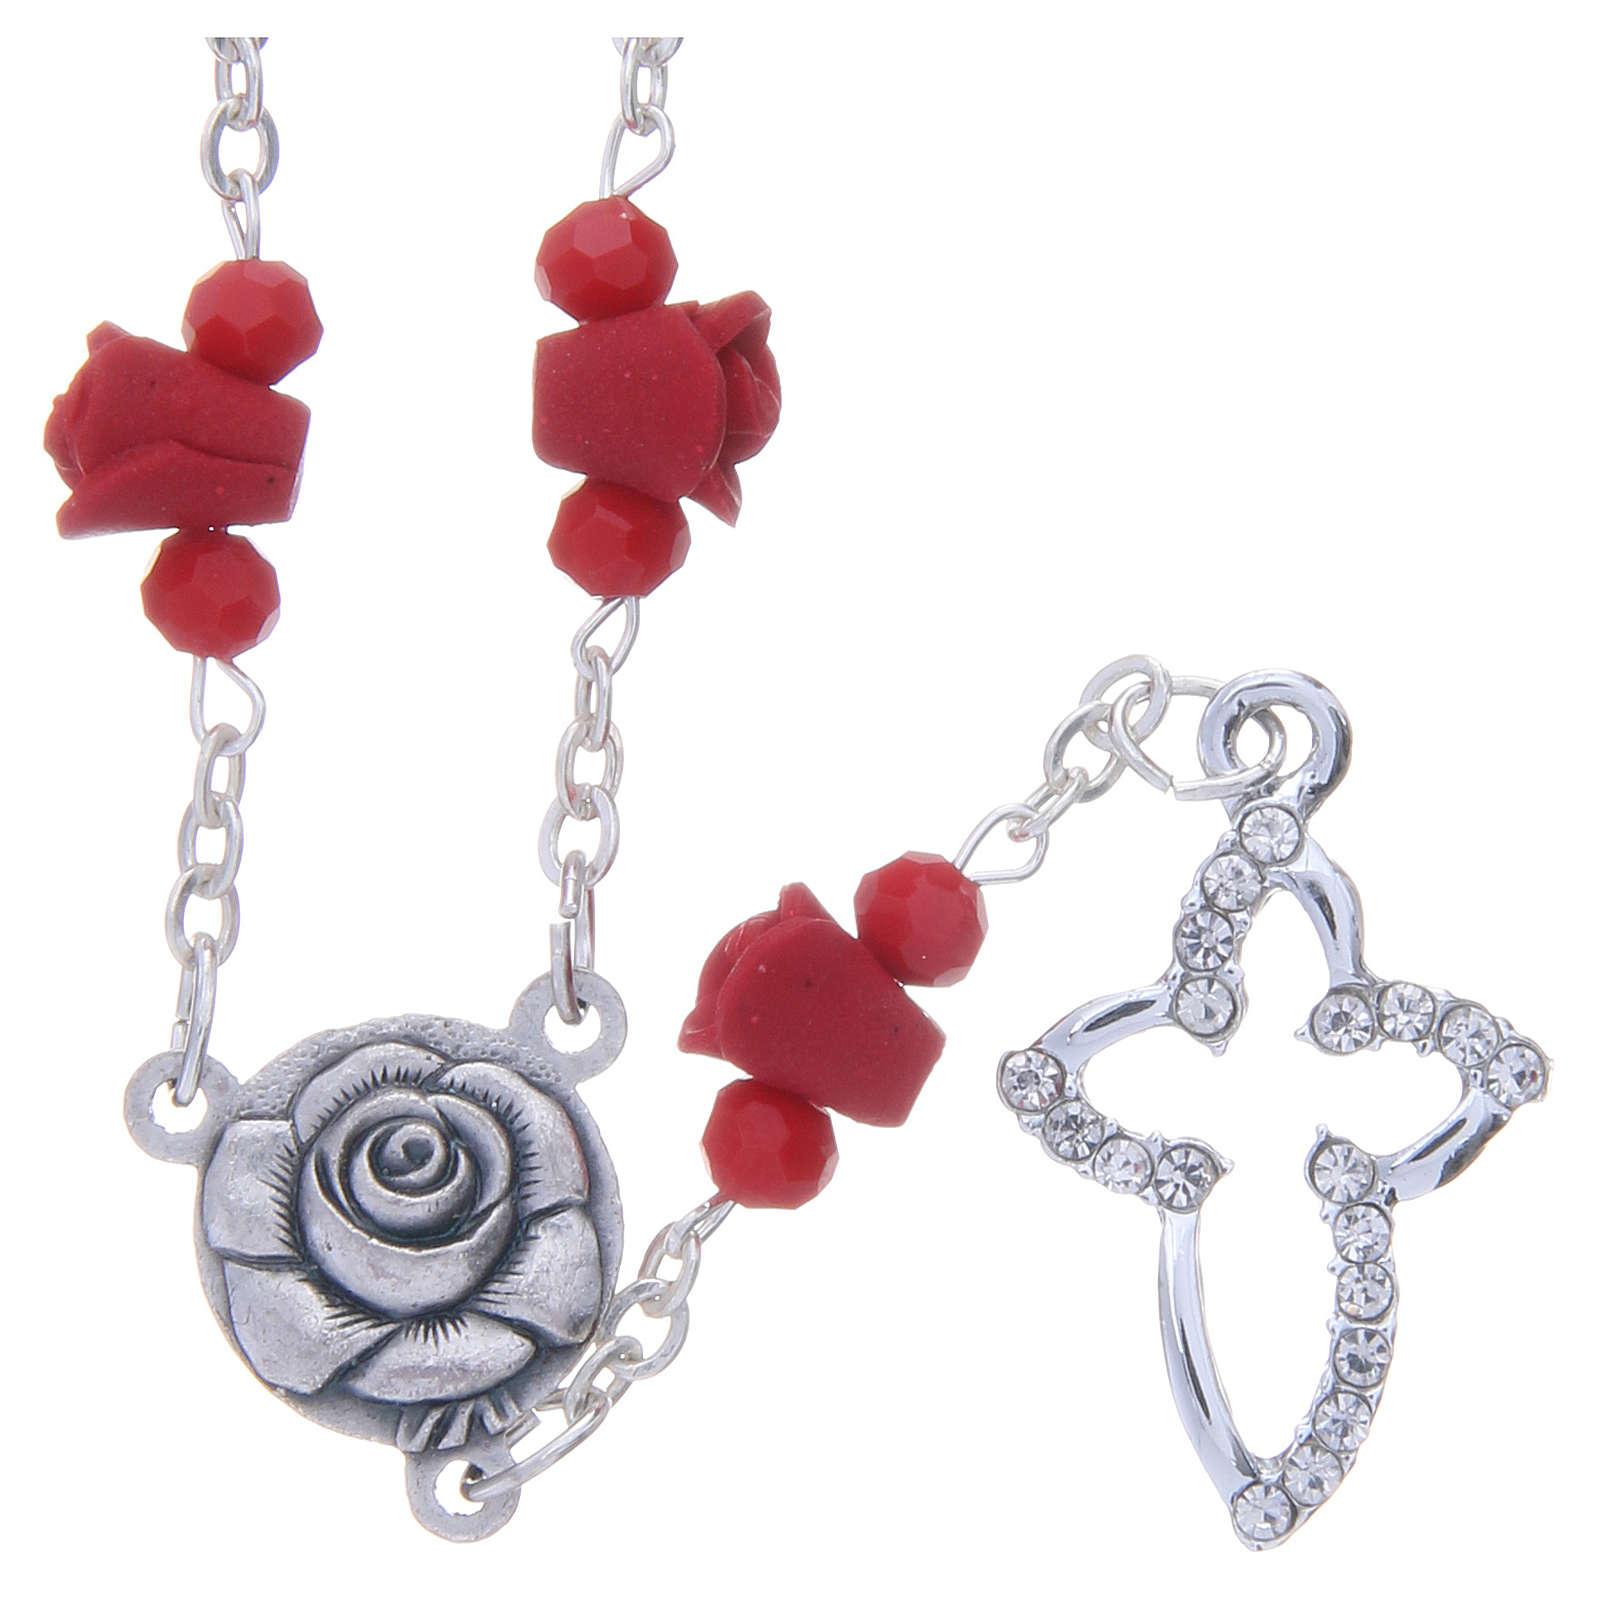 Collier chapelet Medjugorje rouge roses céramique grains cristal 4